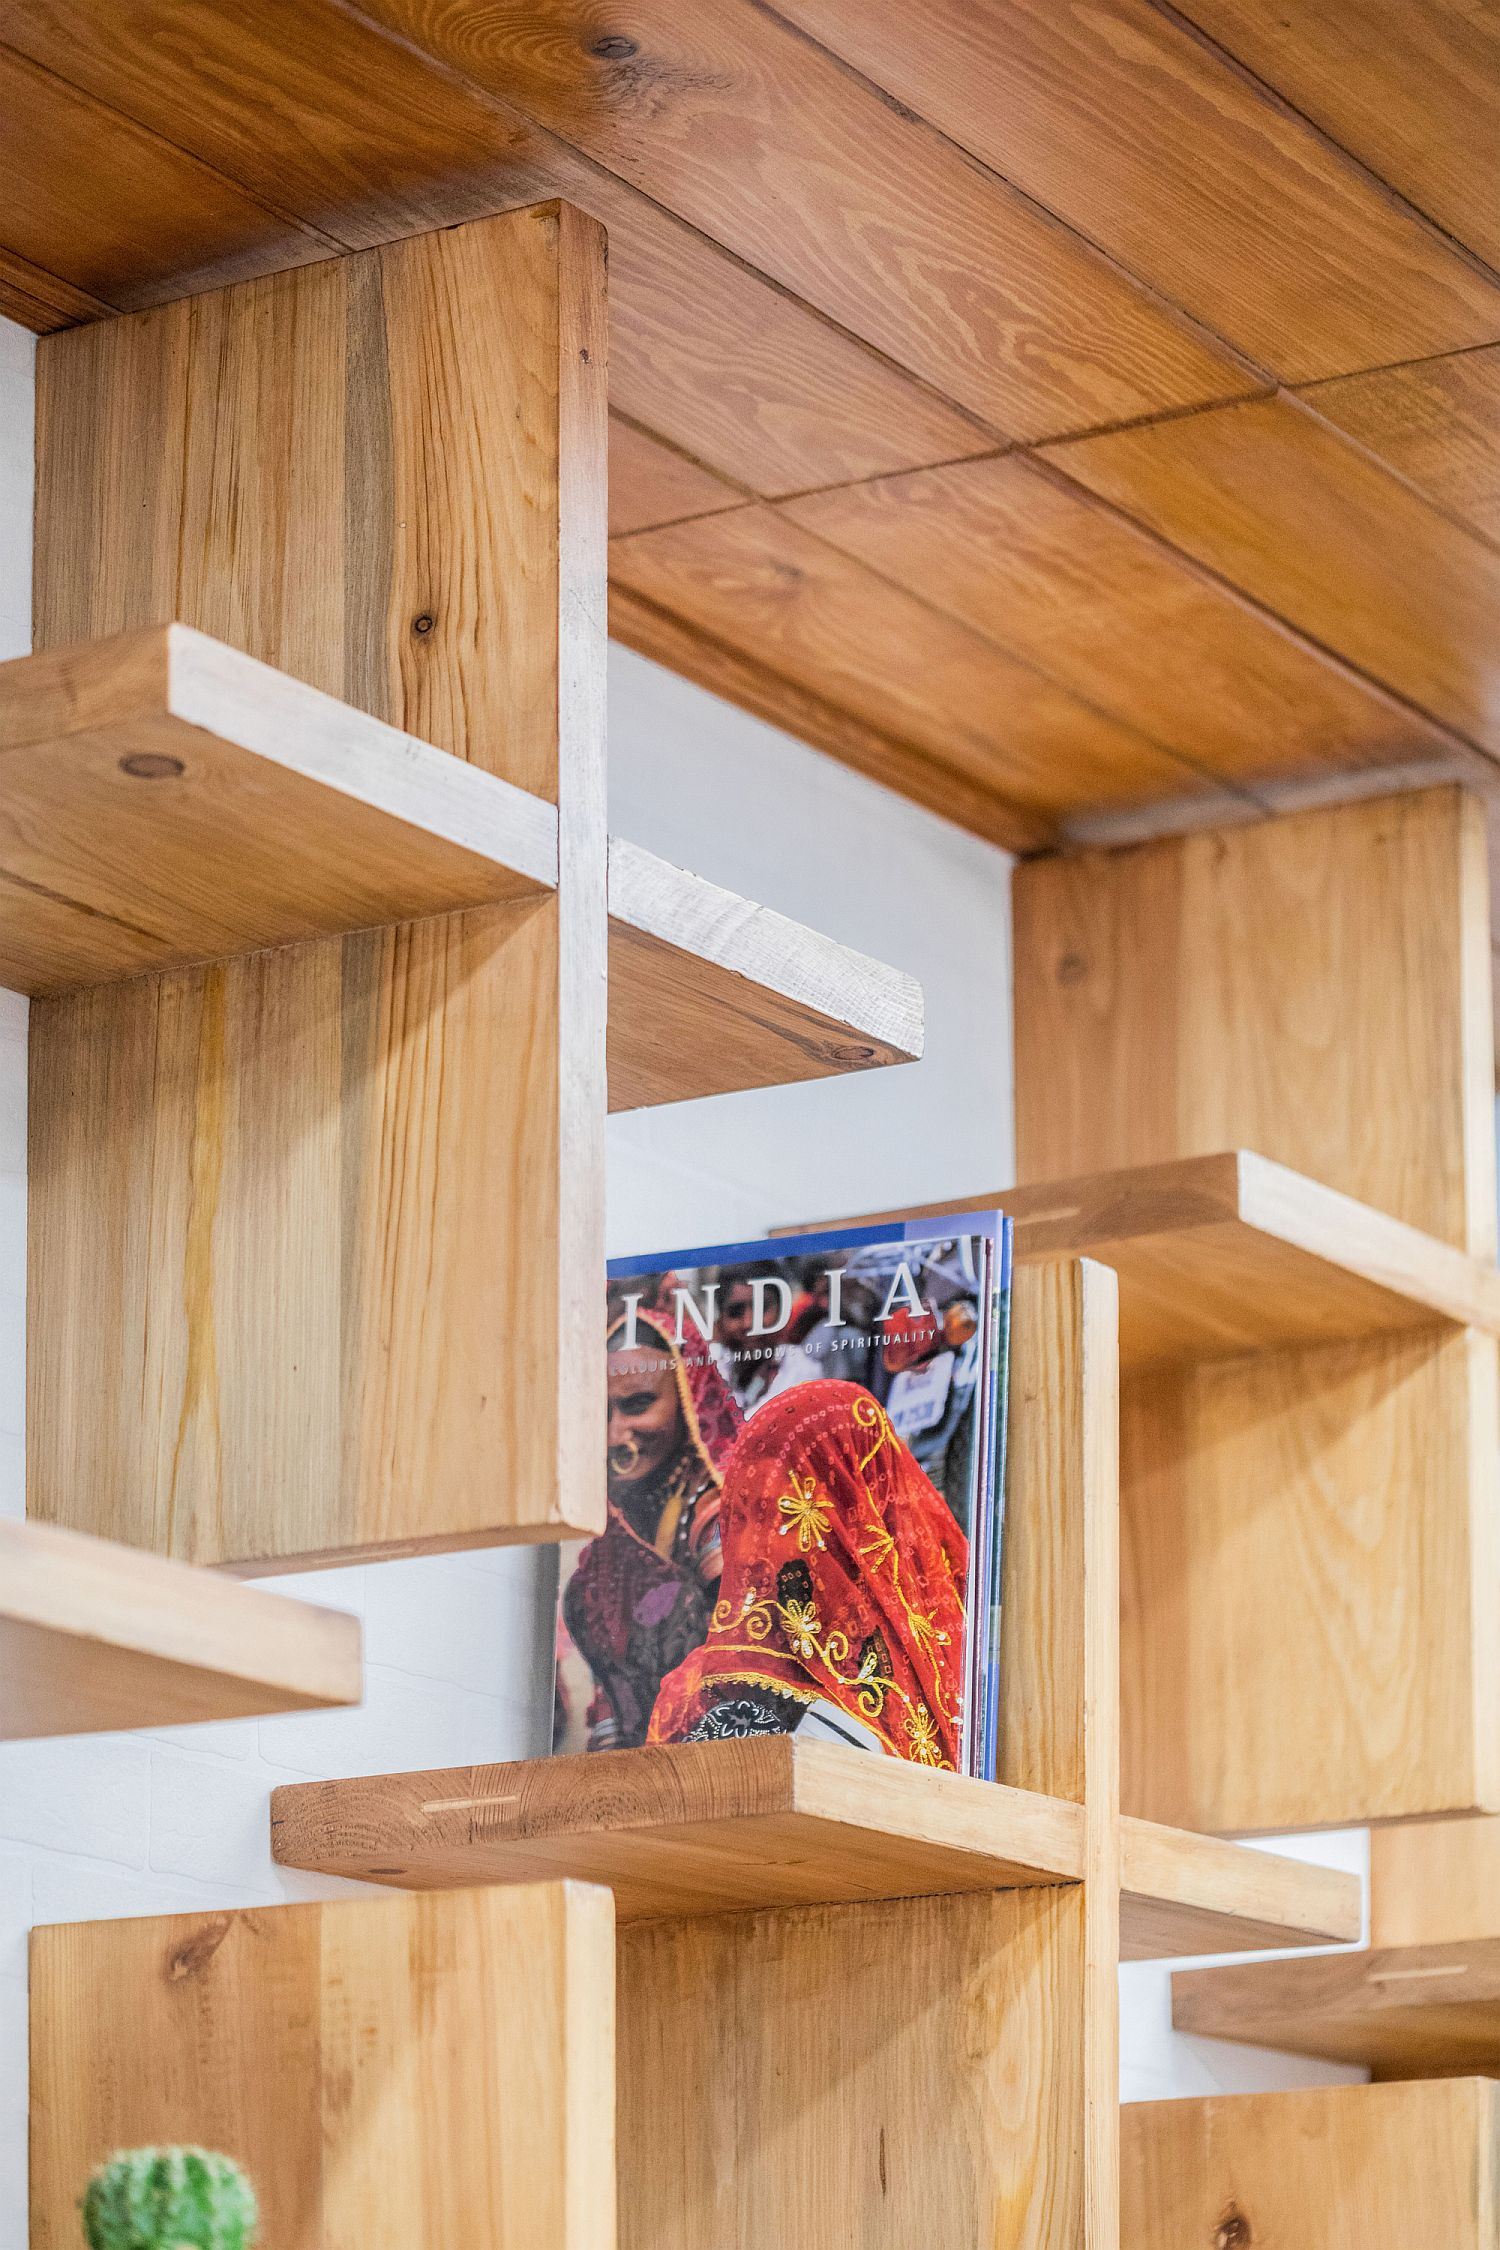 Innovative bookshelf design combines minimalism with woodsy charm